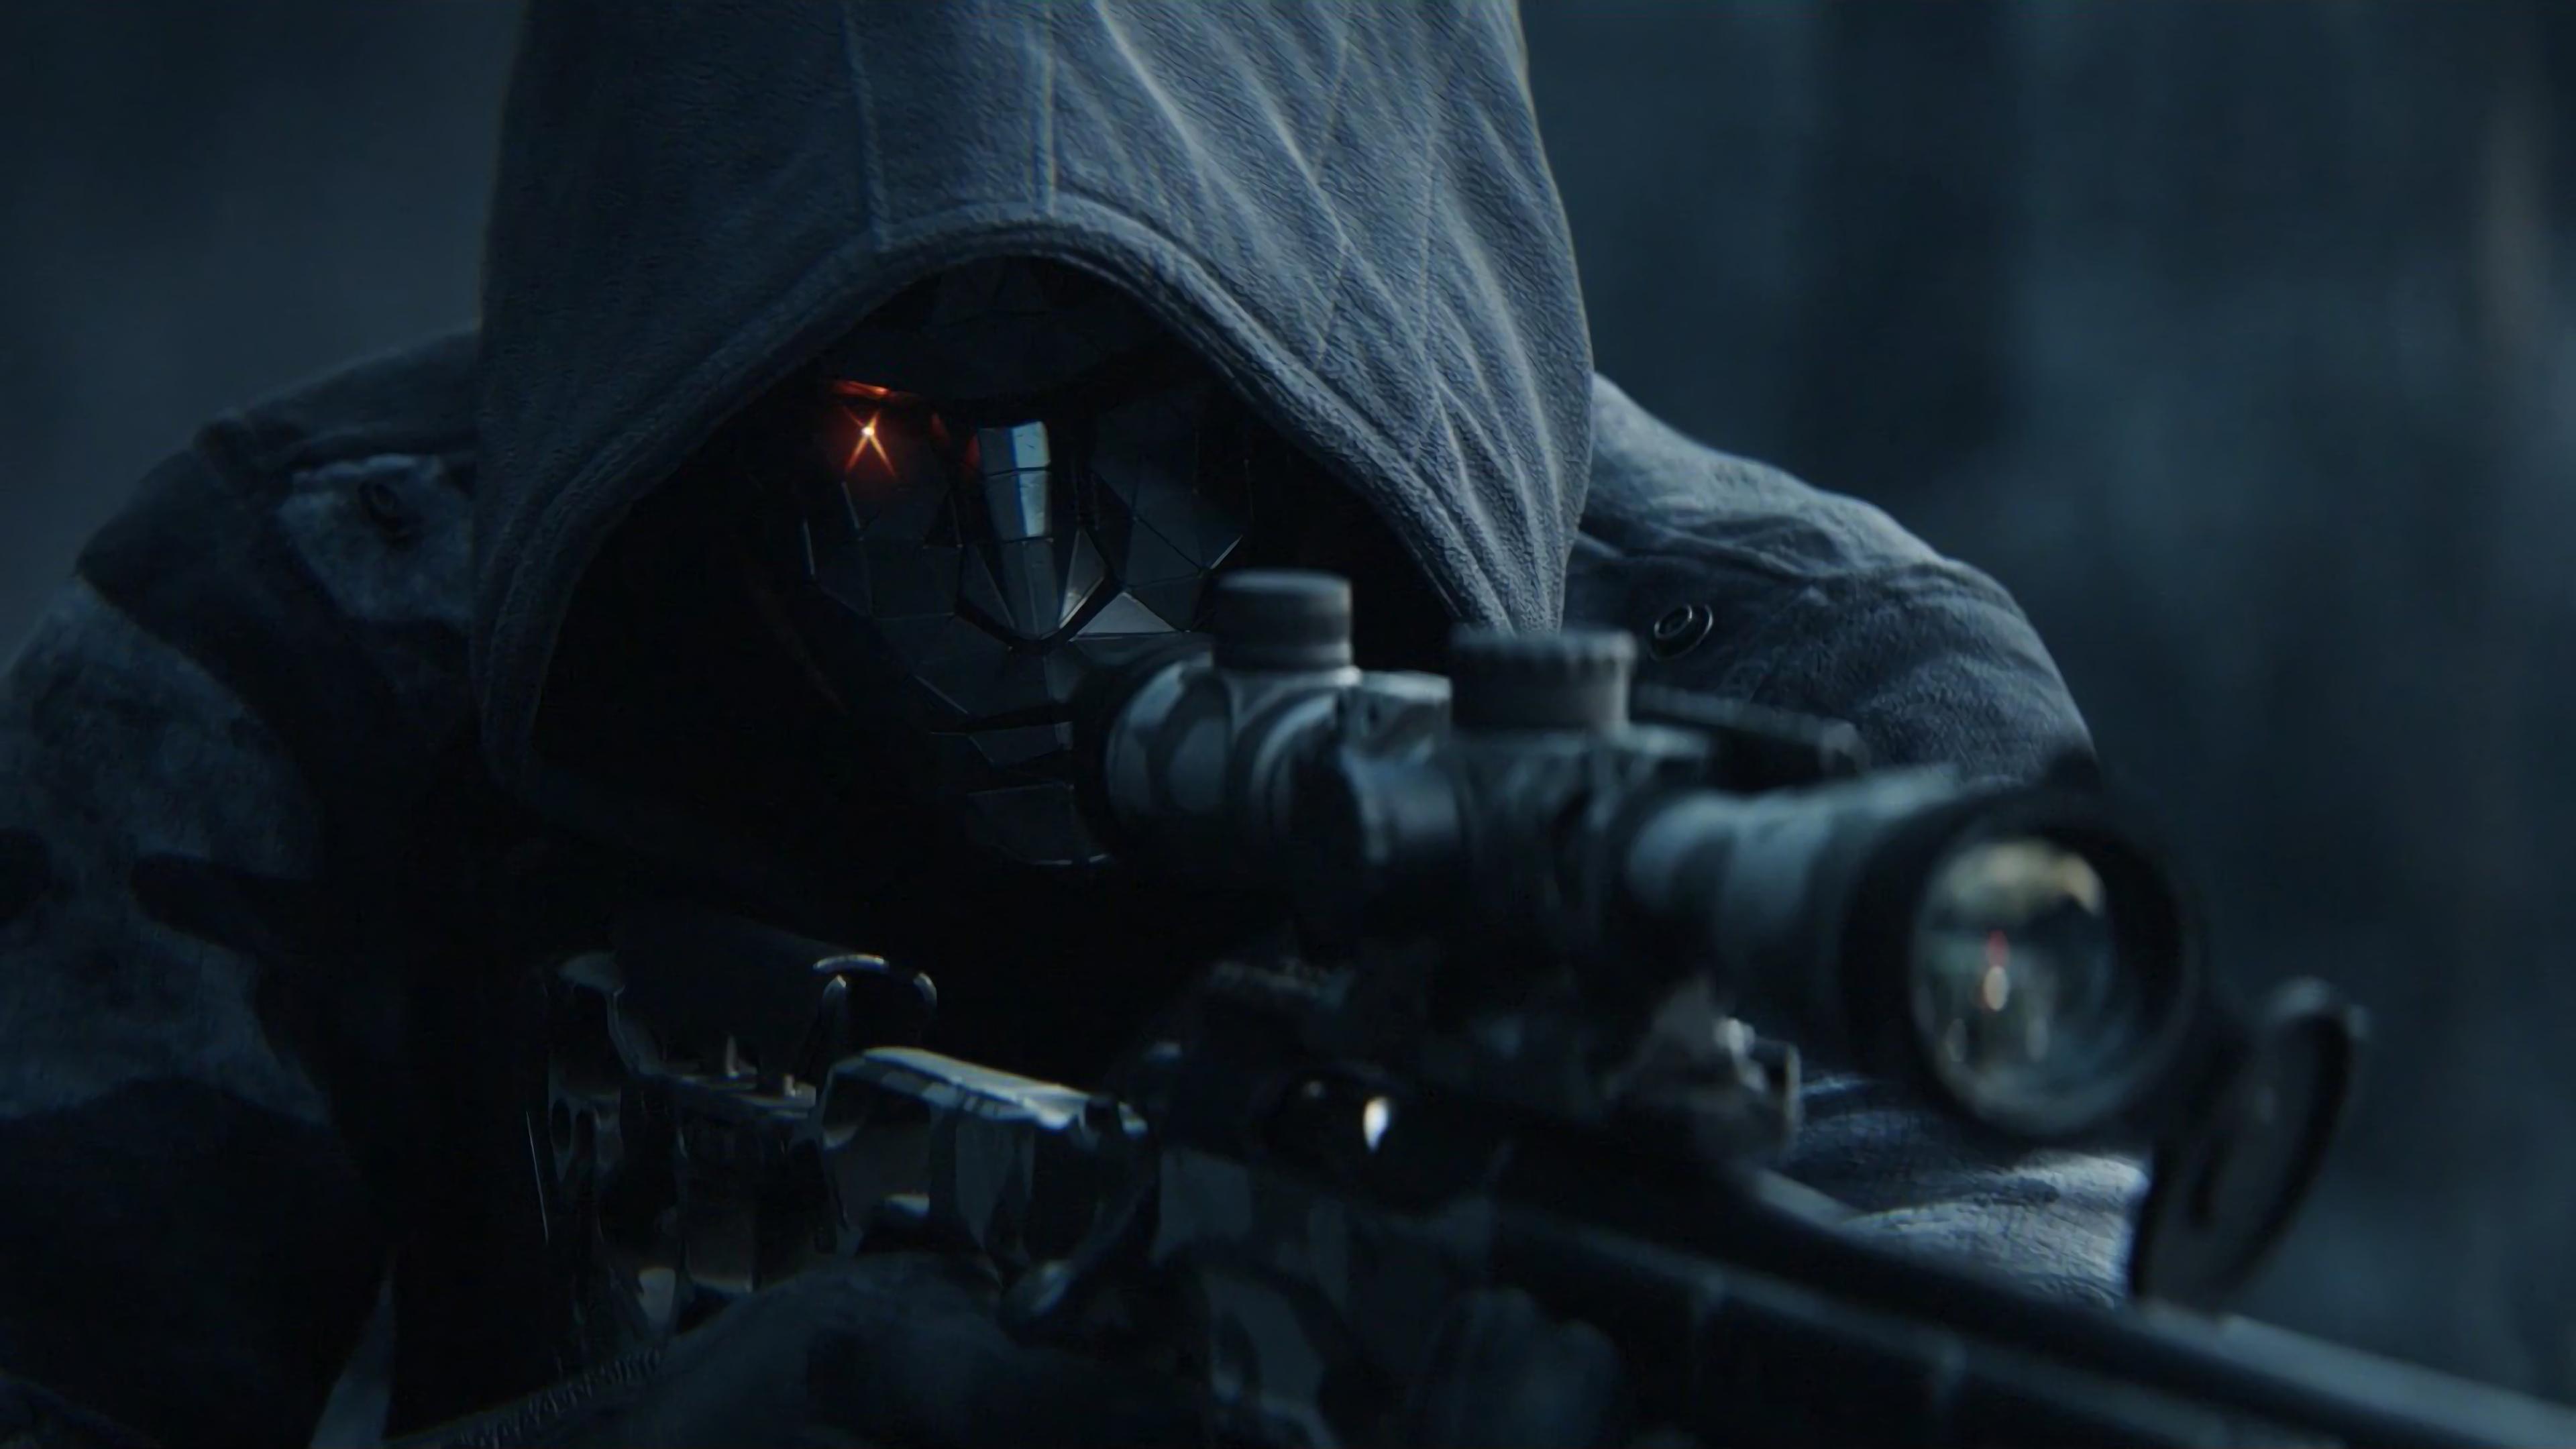 Sniper Ghost Warrior Contracts 4k Wallpaper 1